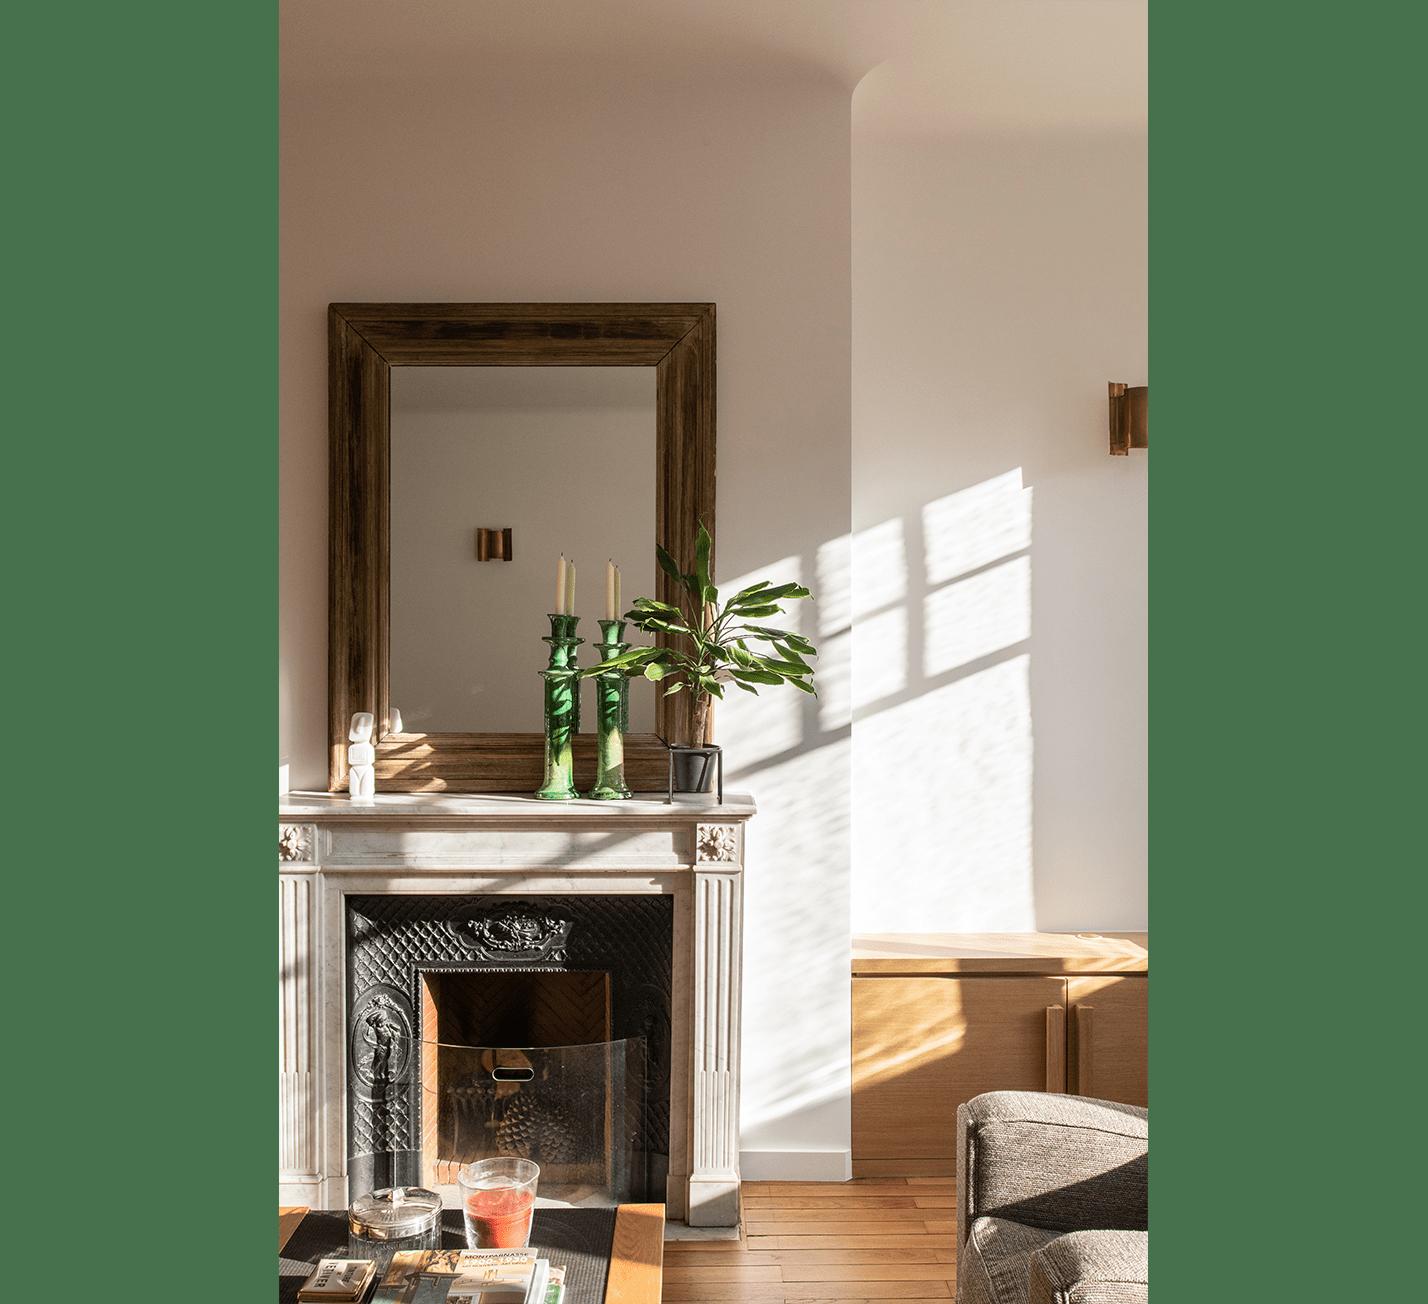 Projet-Emile-Atelier-Steve-Pauline-Borgia-Architecte-interieur-11-min